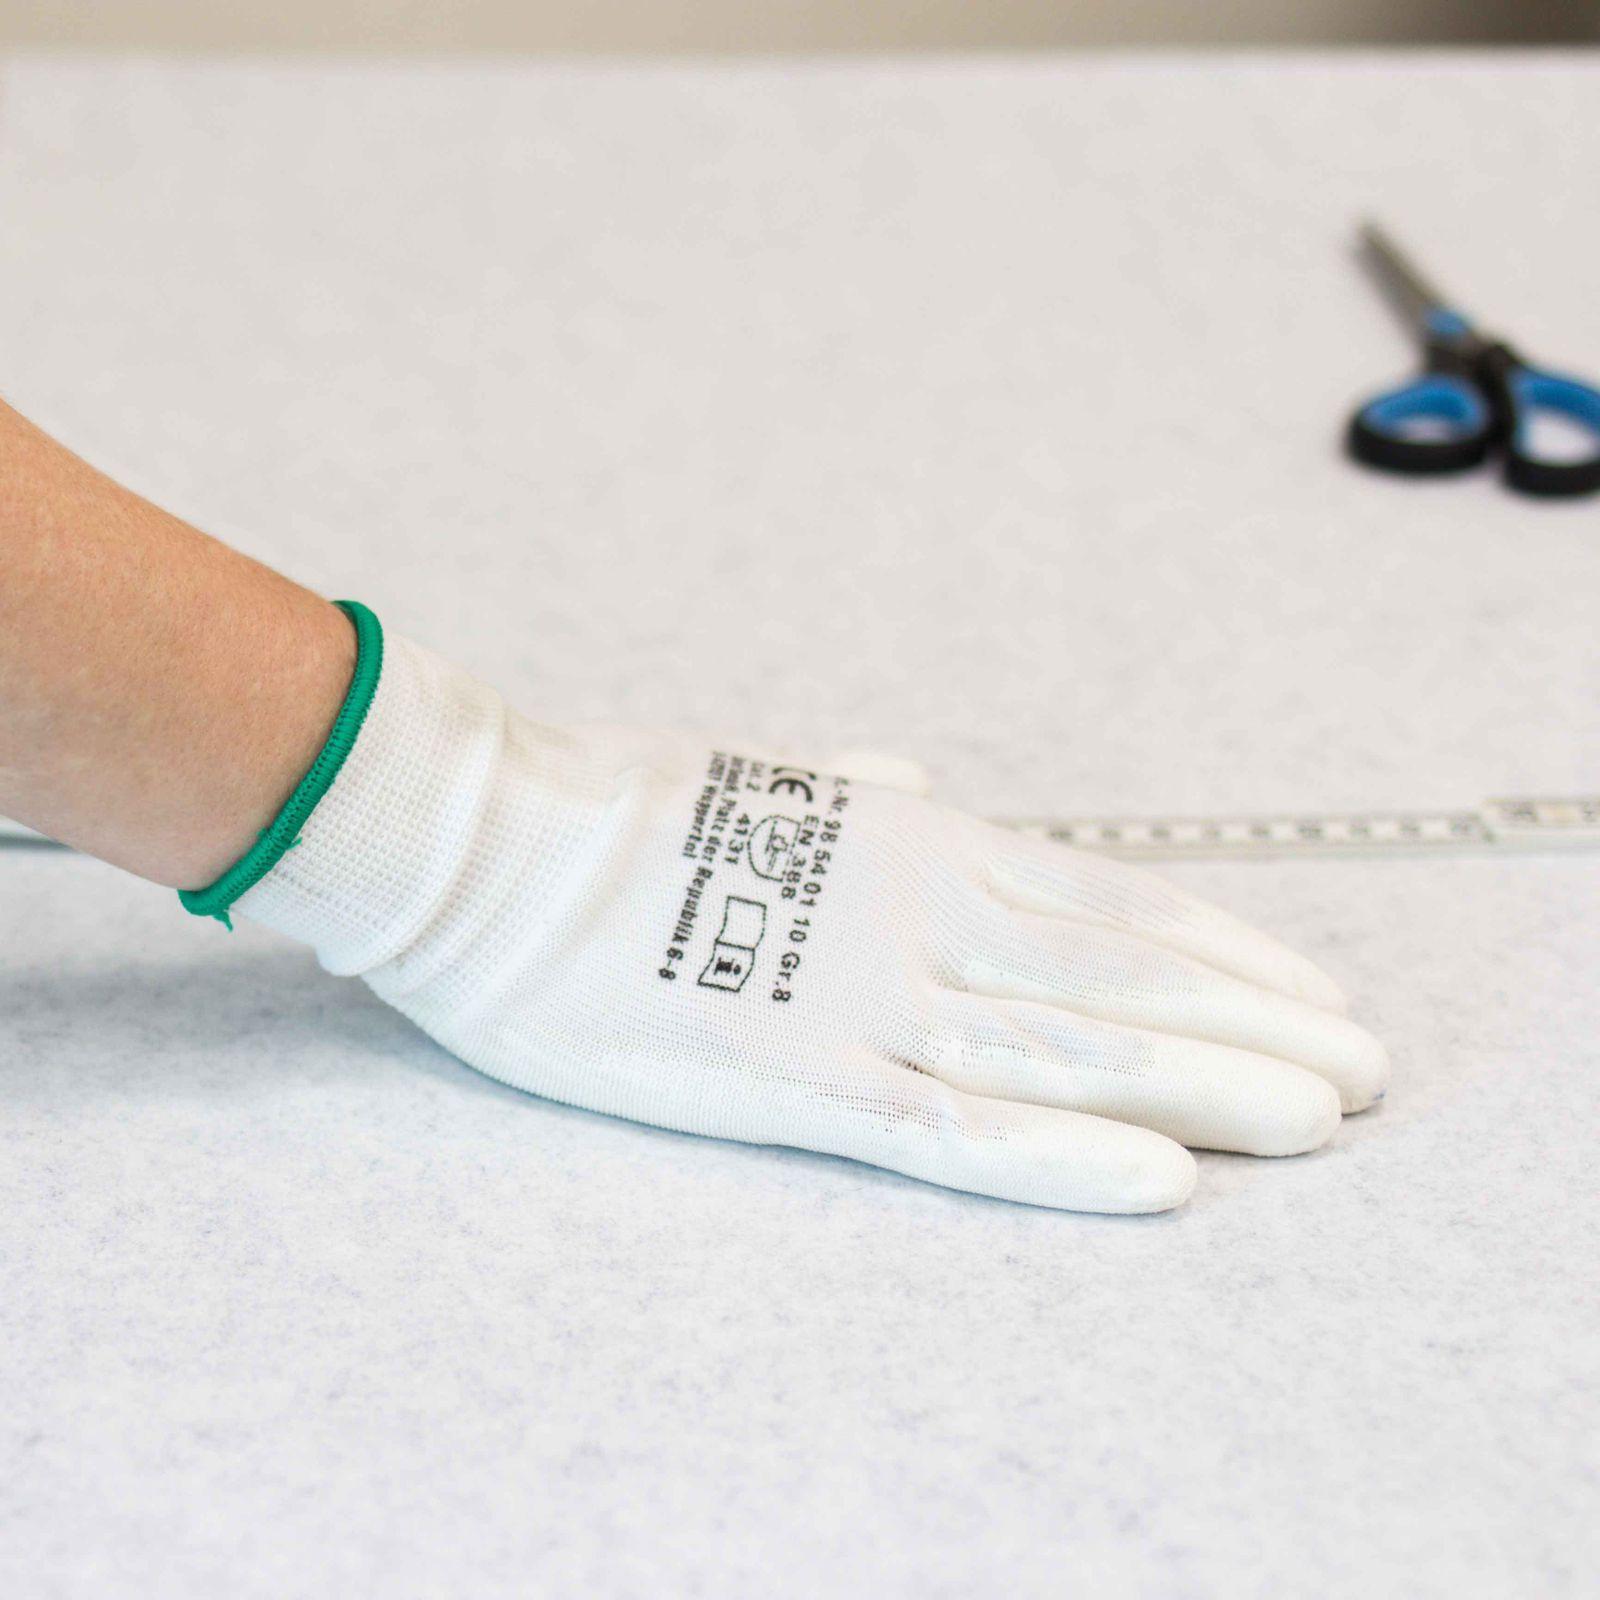 Arbeitshandschuhe 1 Paar Montagehandschuhe Senso Grip weiß PU Malerhandschuh